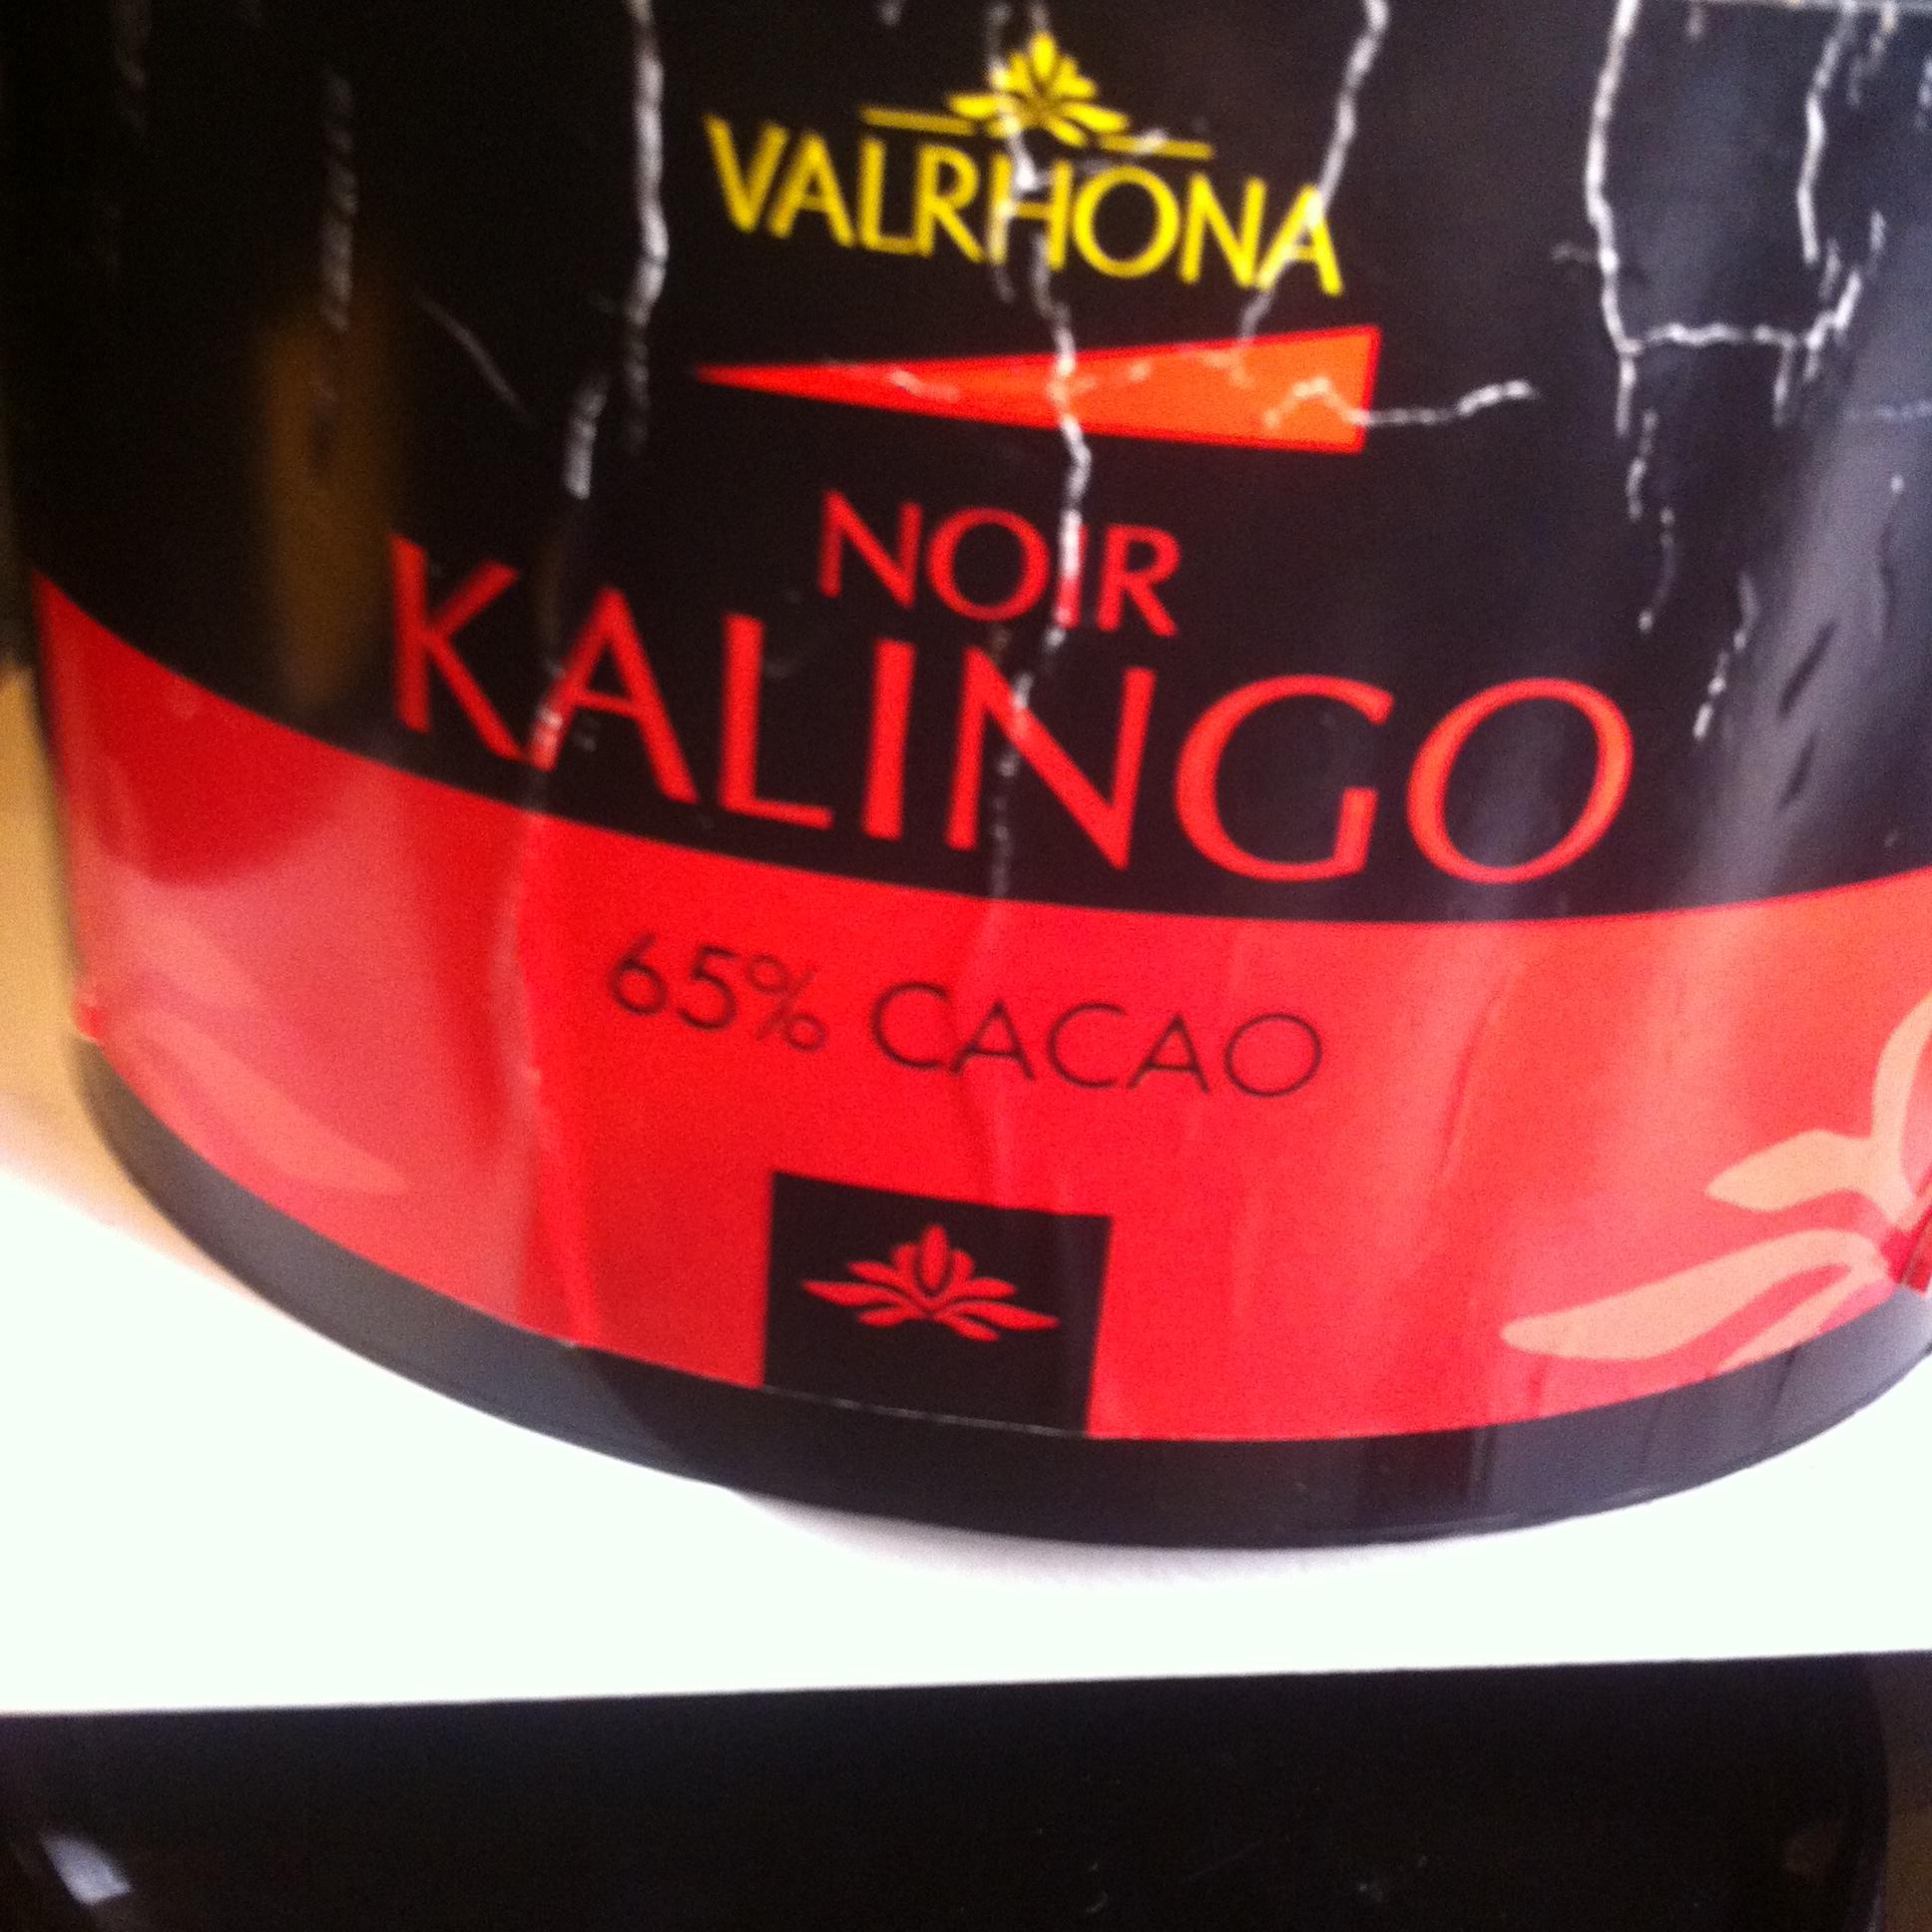 cozy and nice. Kalingo chocolate